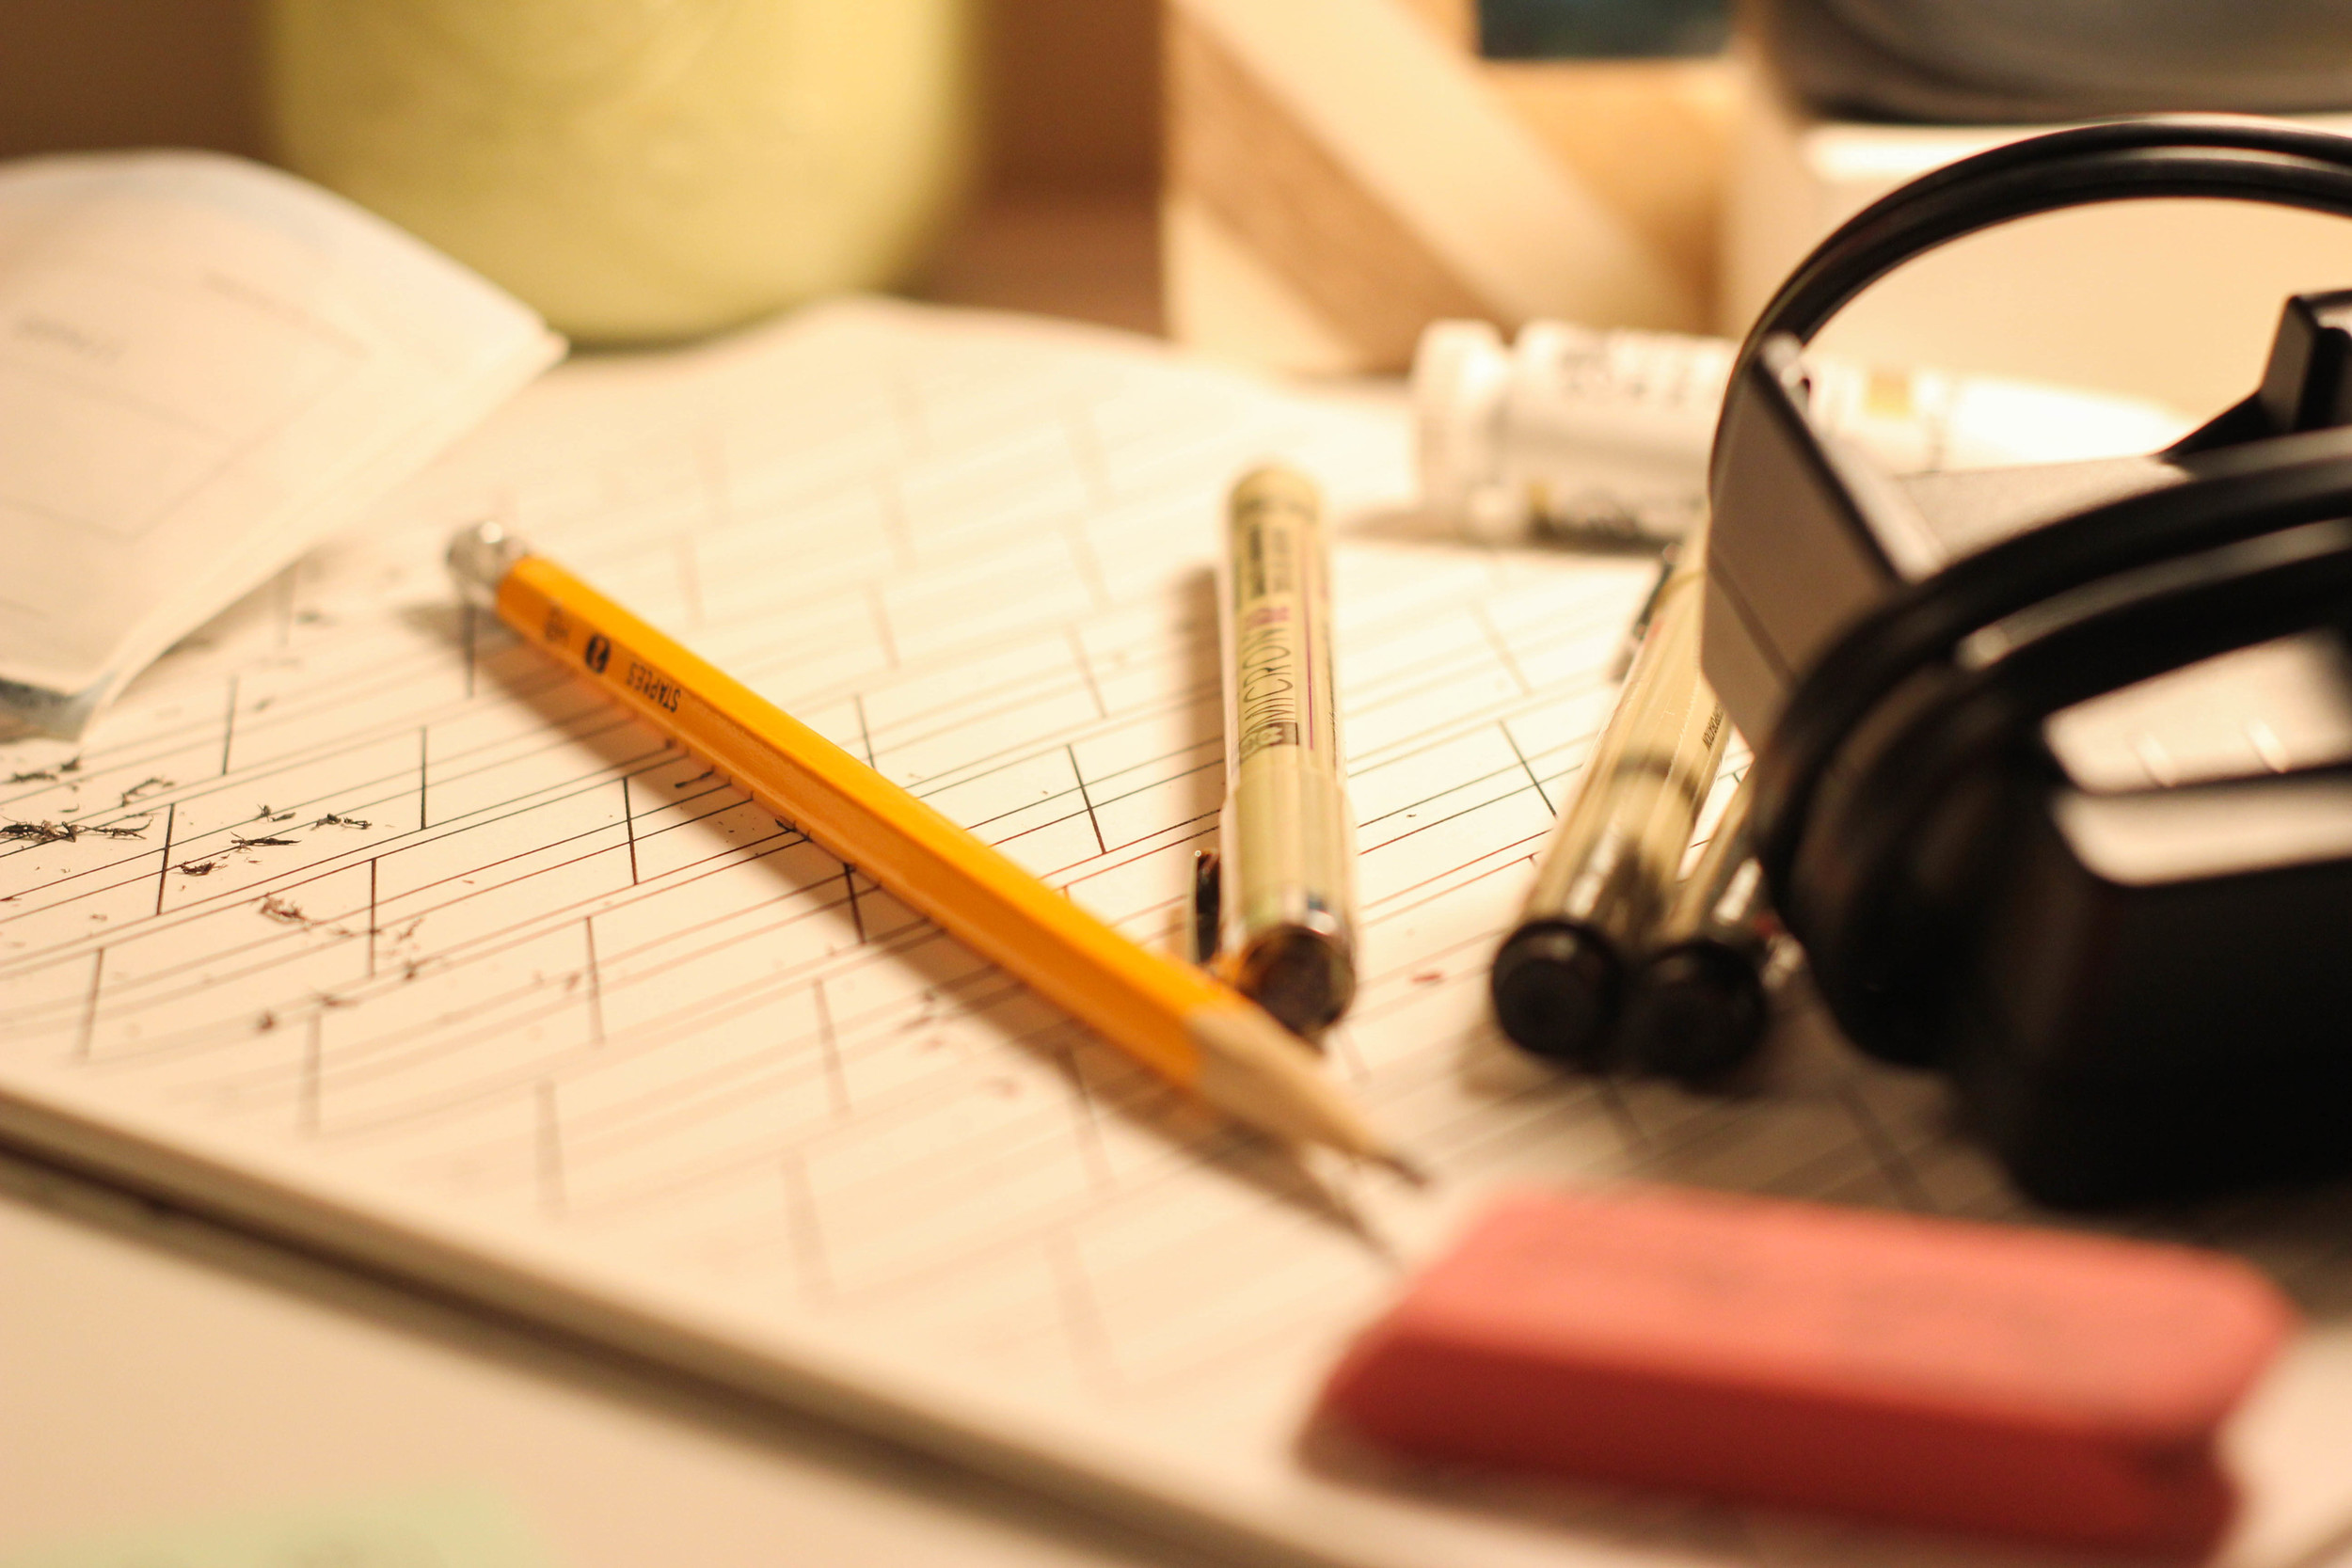 Pencils erase. Ink does not, unfortunately.